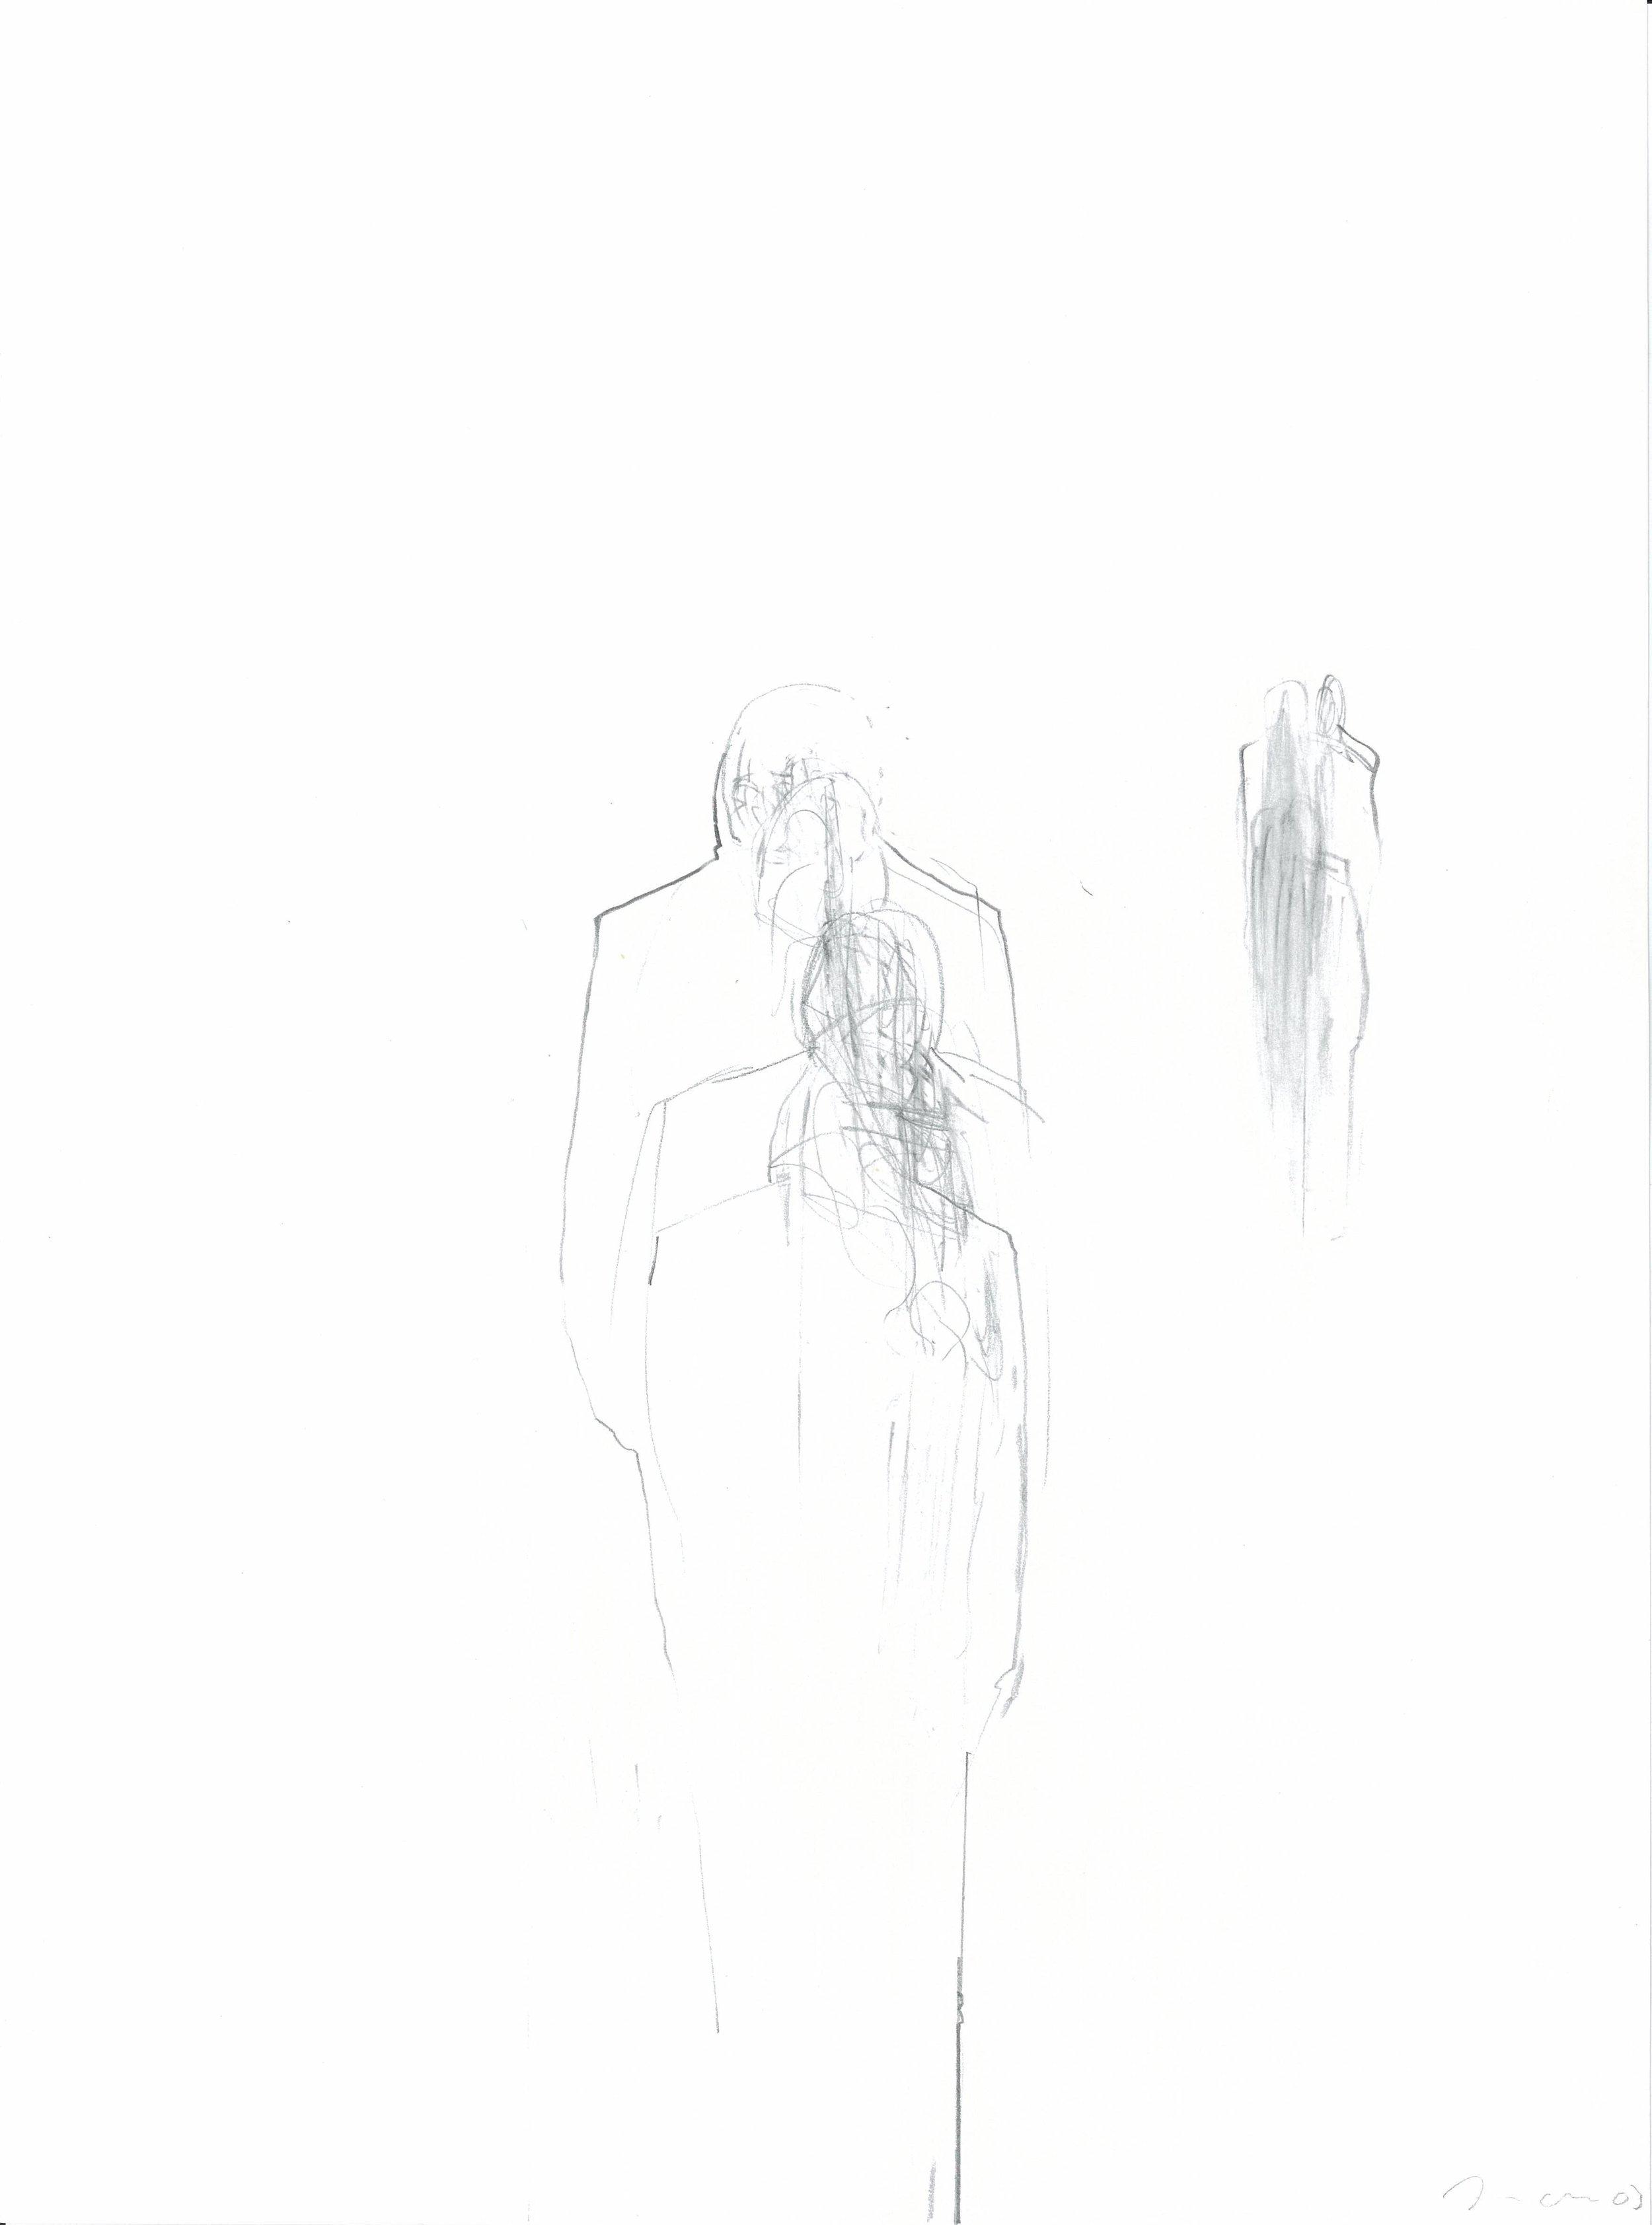 A.Zingerle - 2001, Pencil on paper, 40x30 (9).jpg